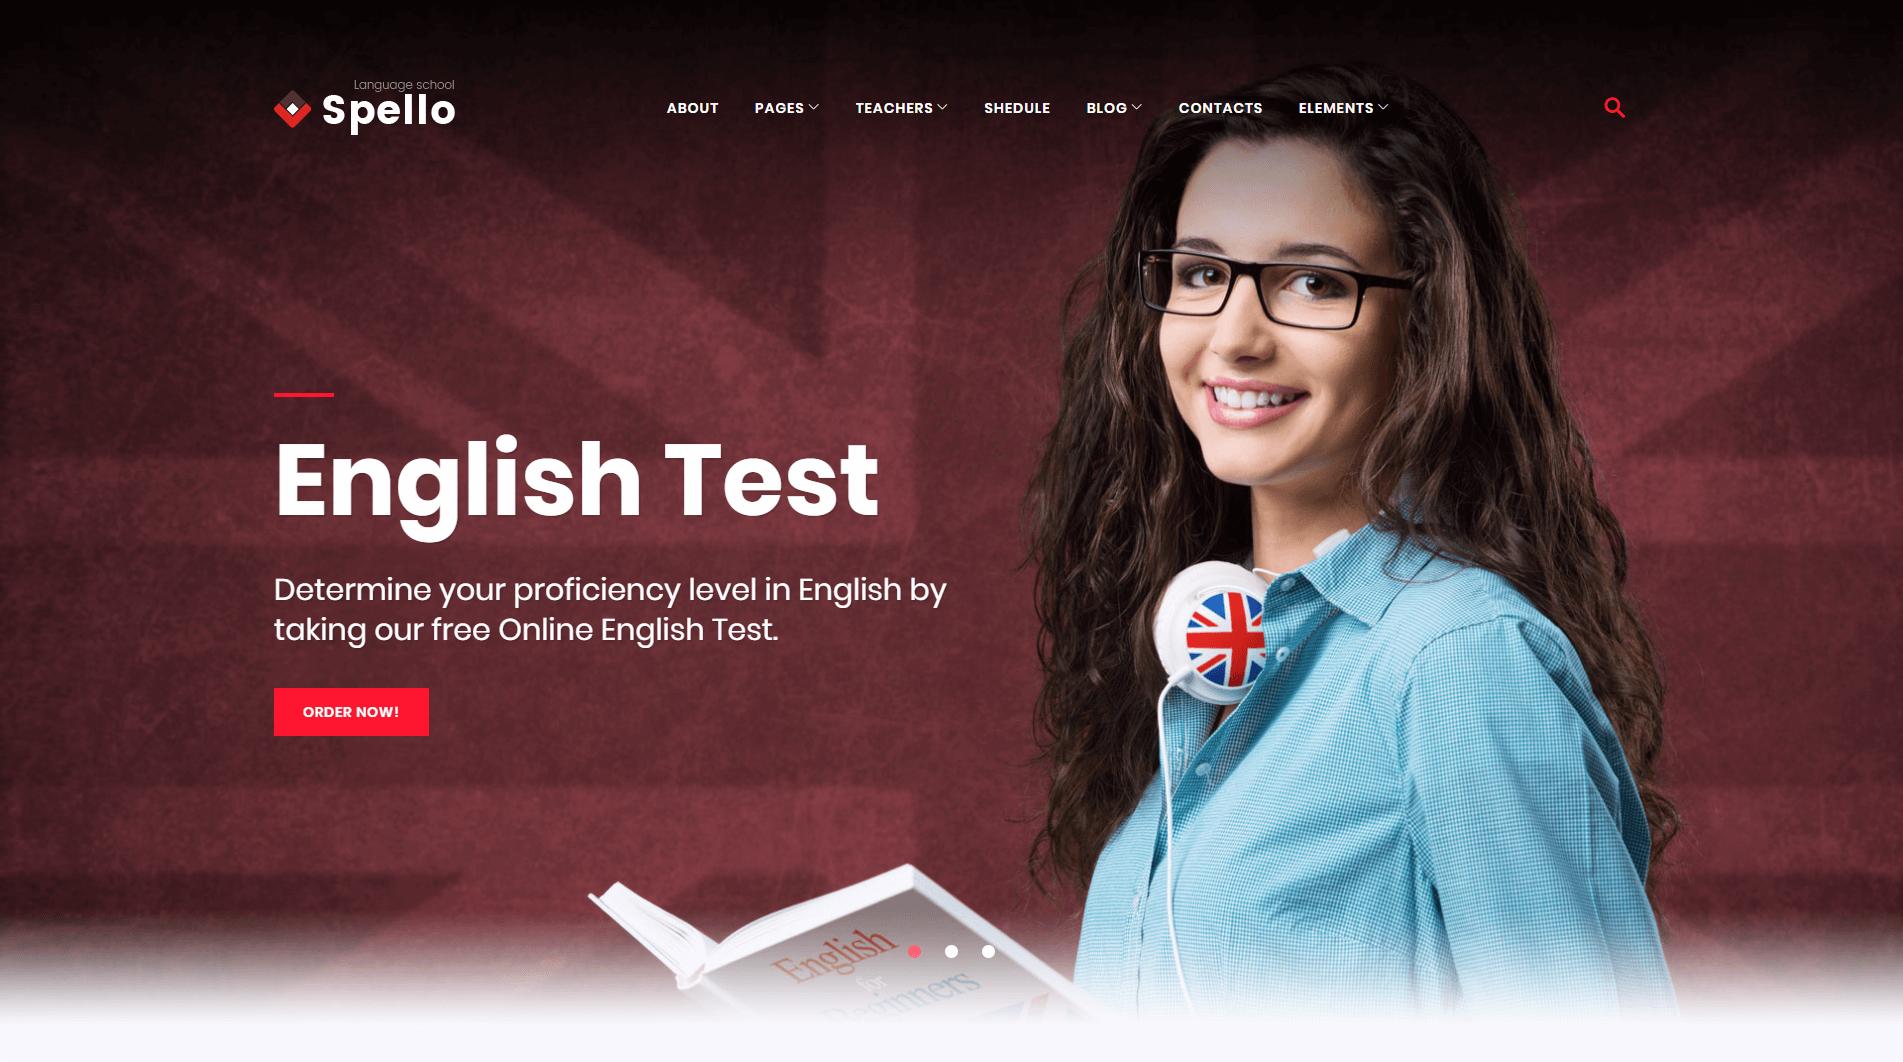 wordpress school website themes